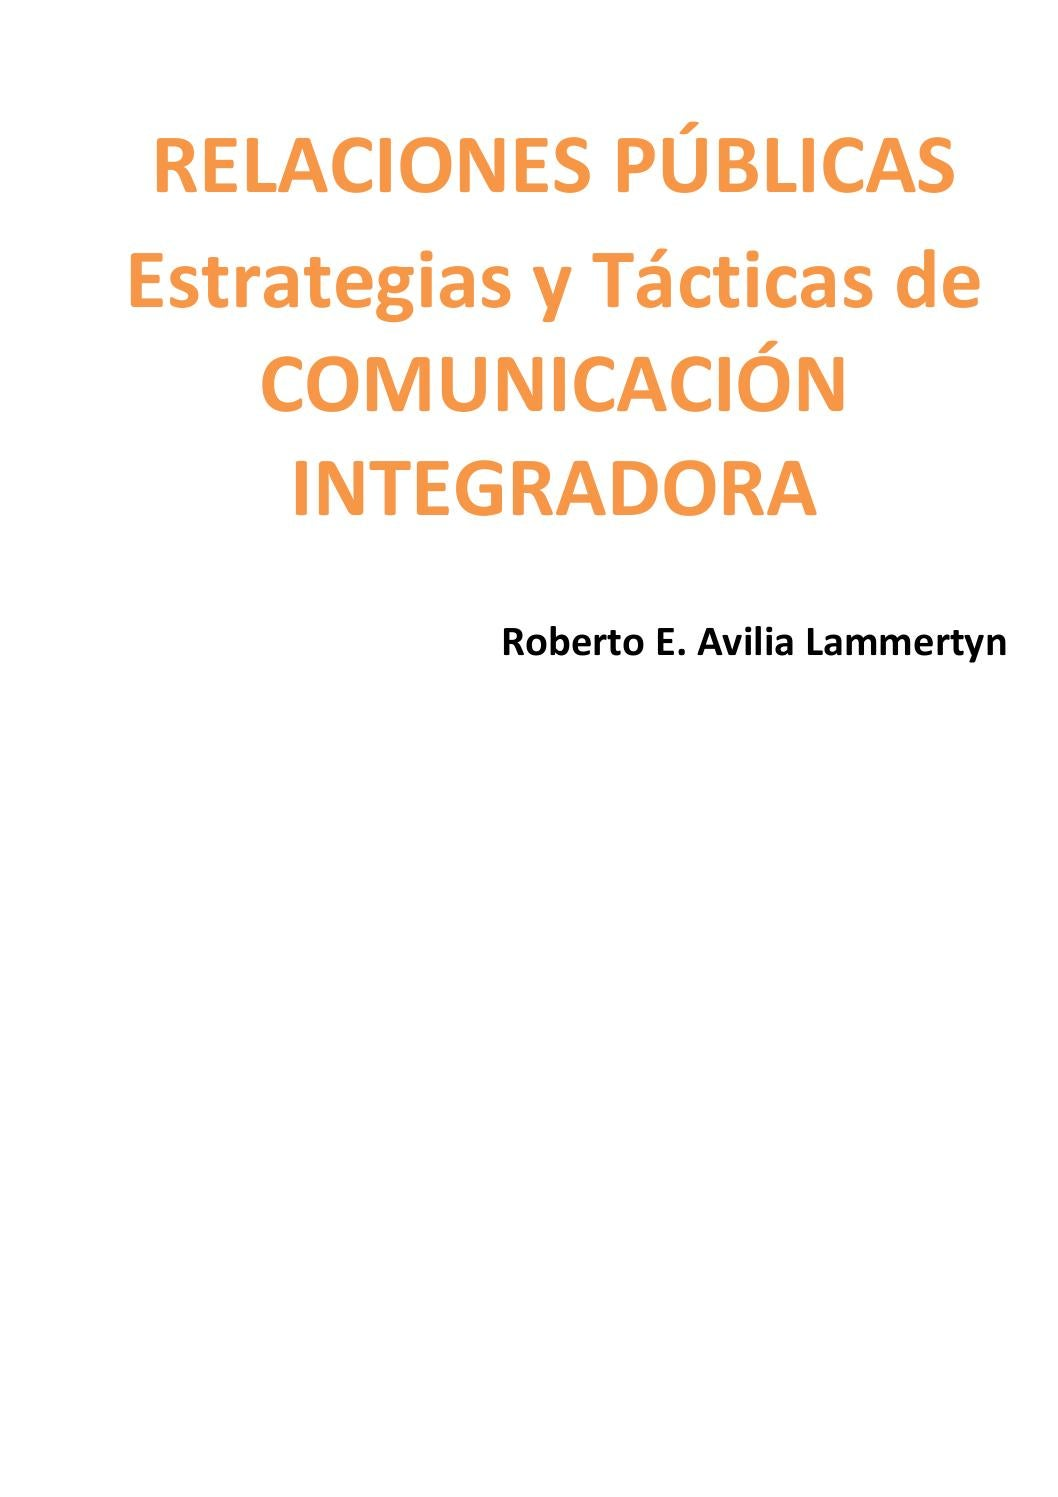 Rr pp estrategias y tacticas de comunicacion integradora avilia by Marcos  Gasparutti - issuu d11b41ca21b